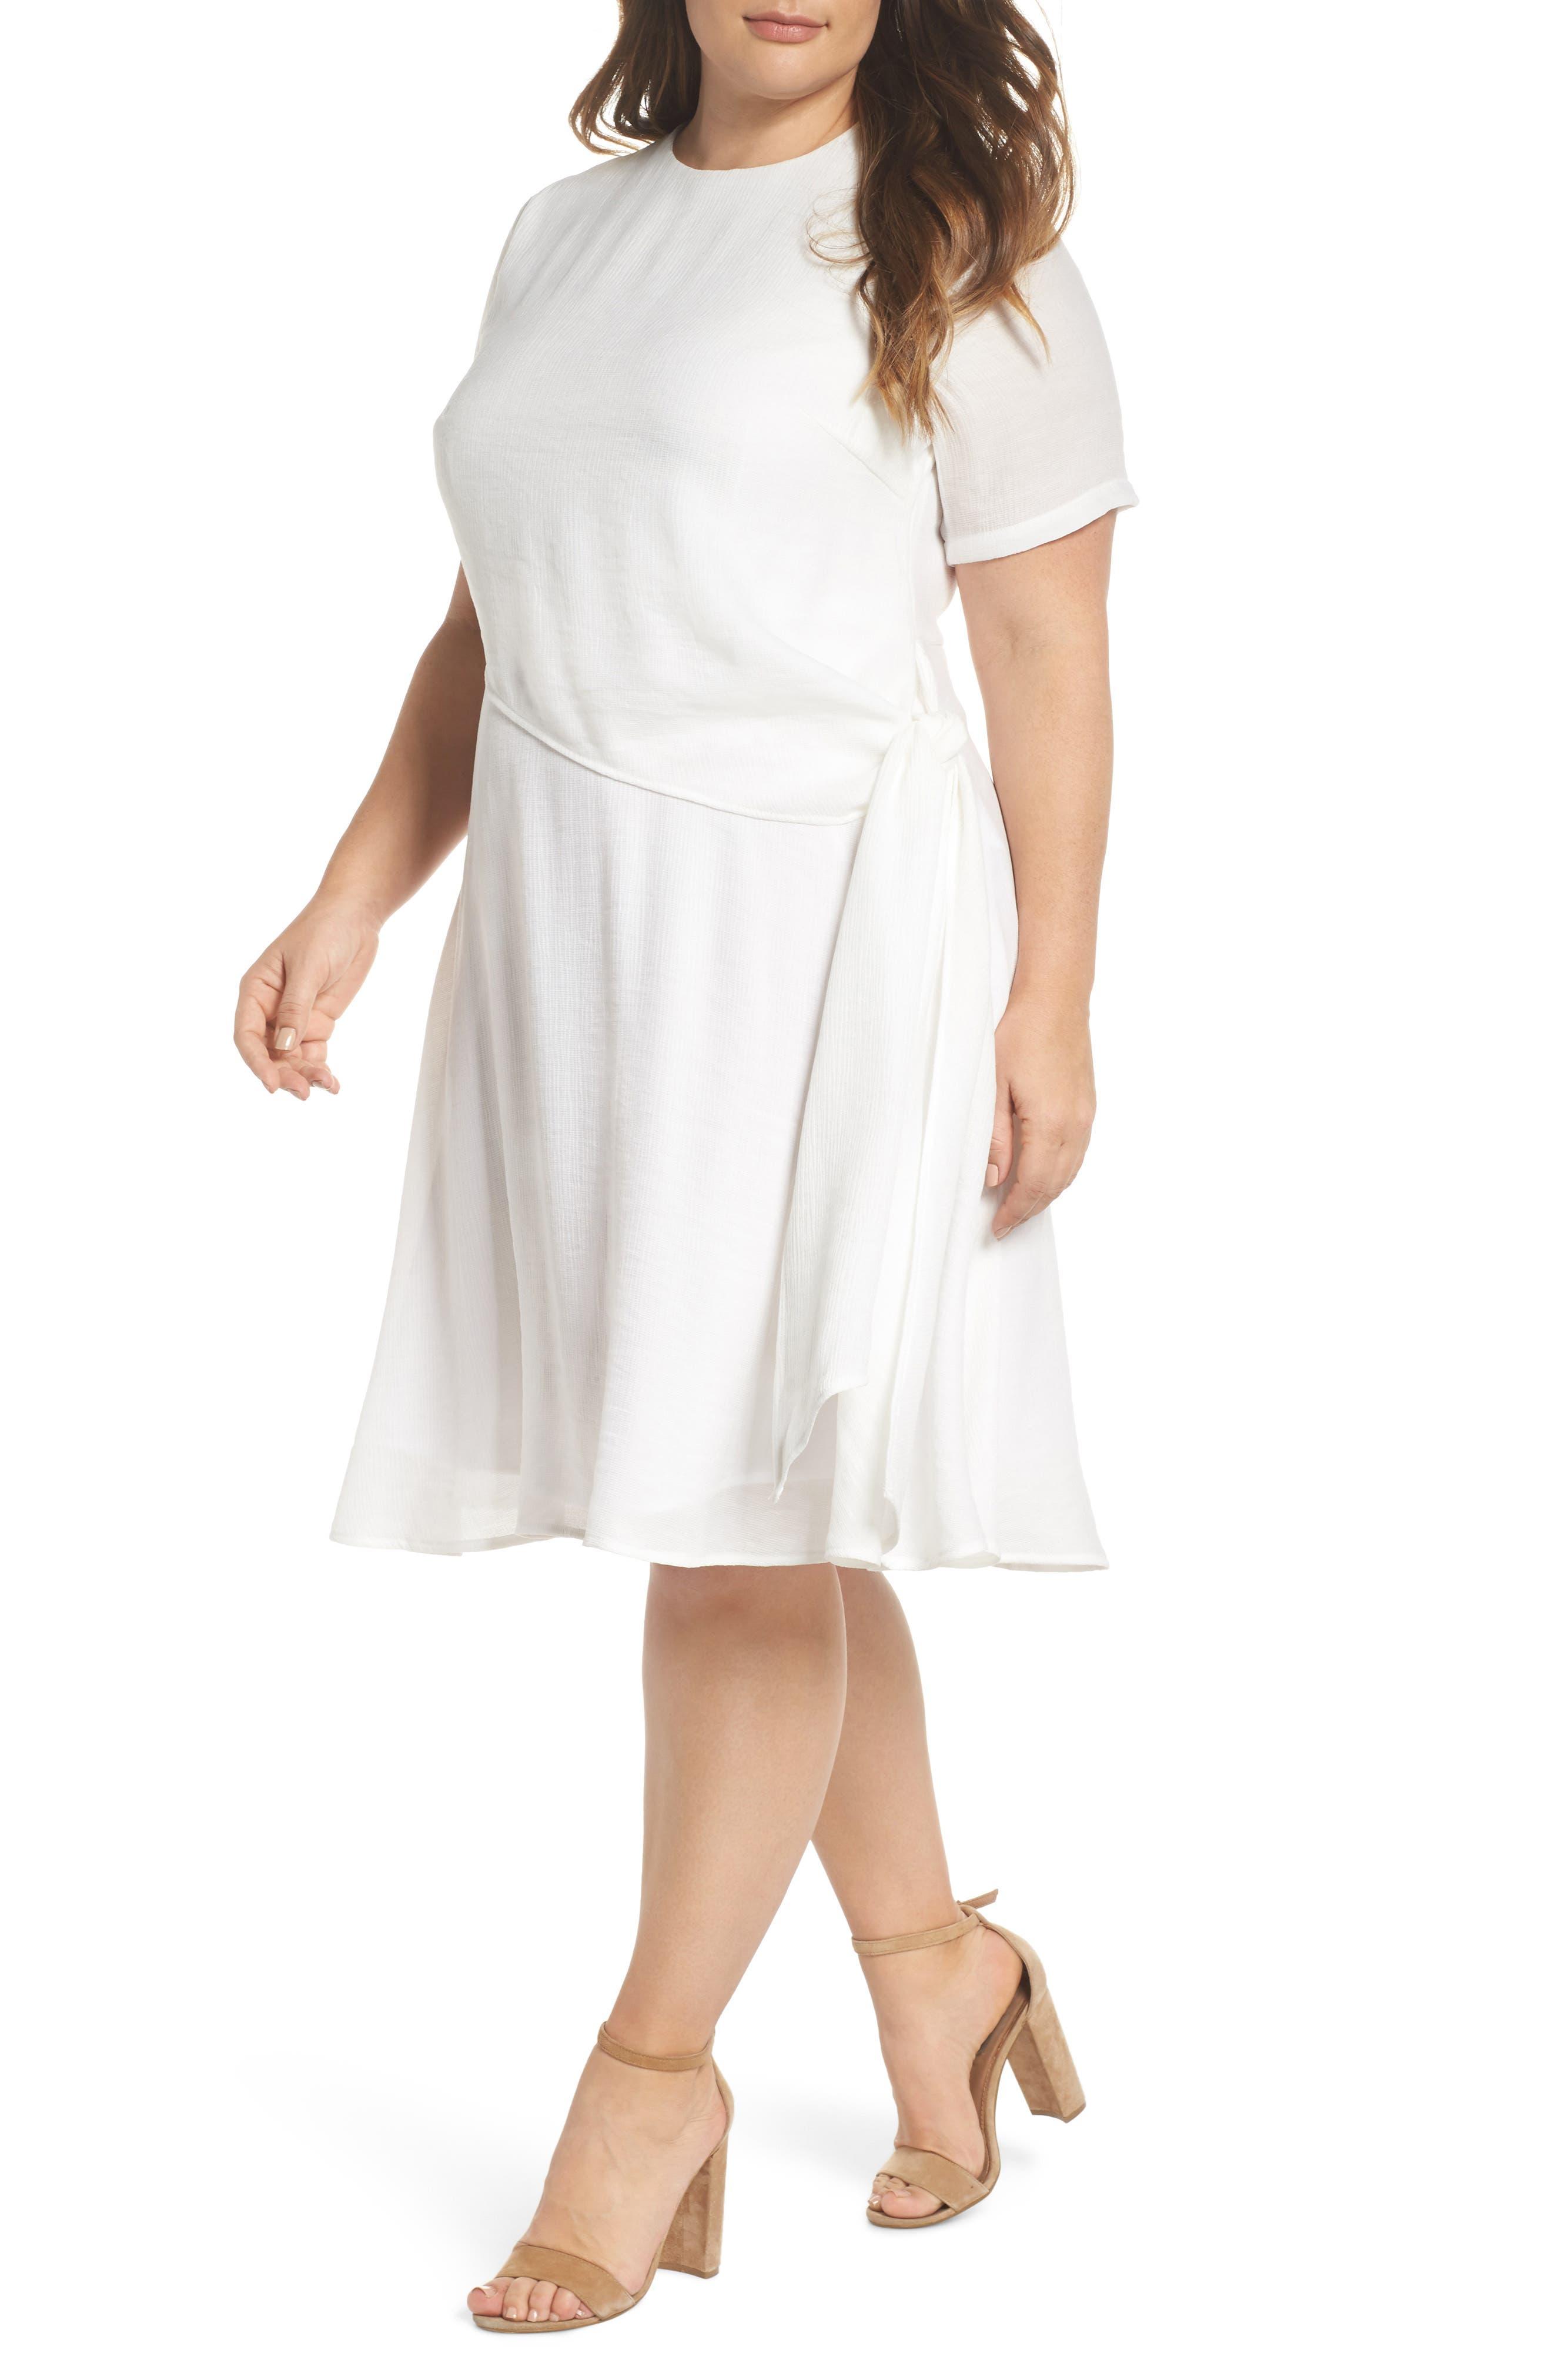 Plus Size Easter Dresses 2018